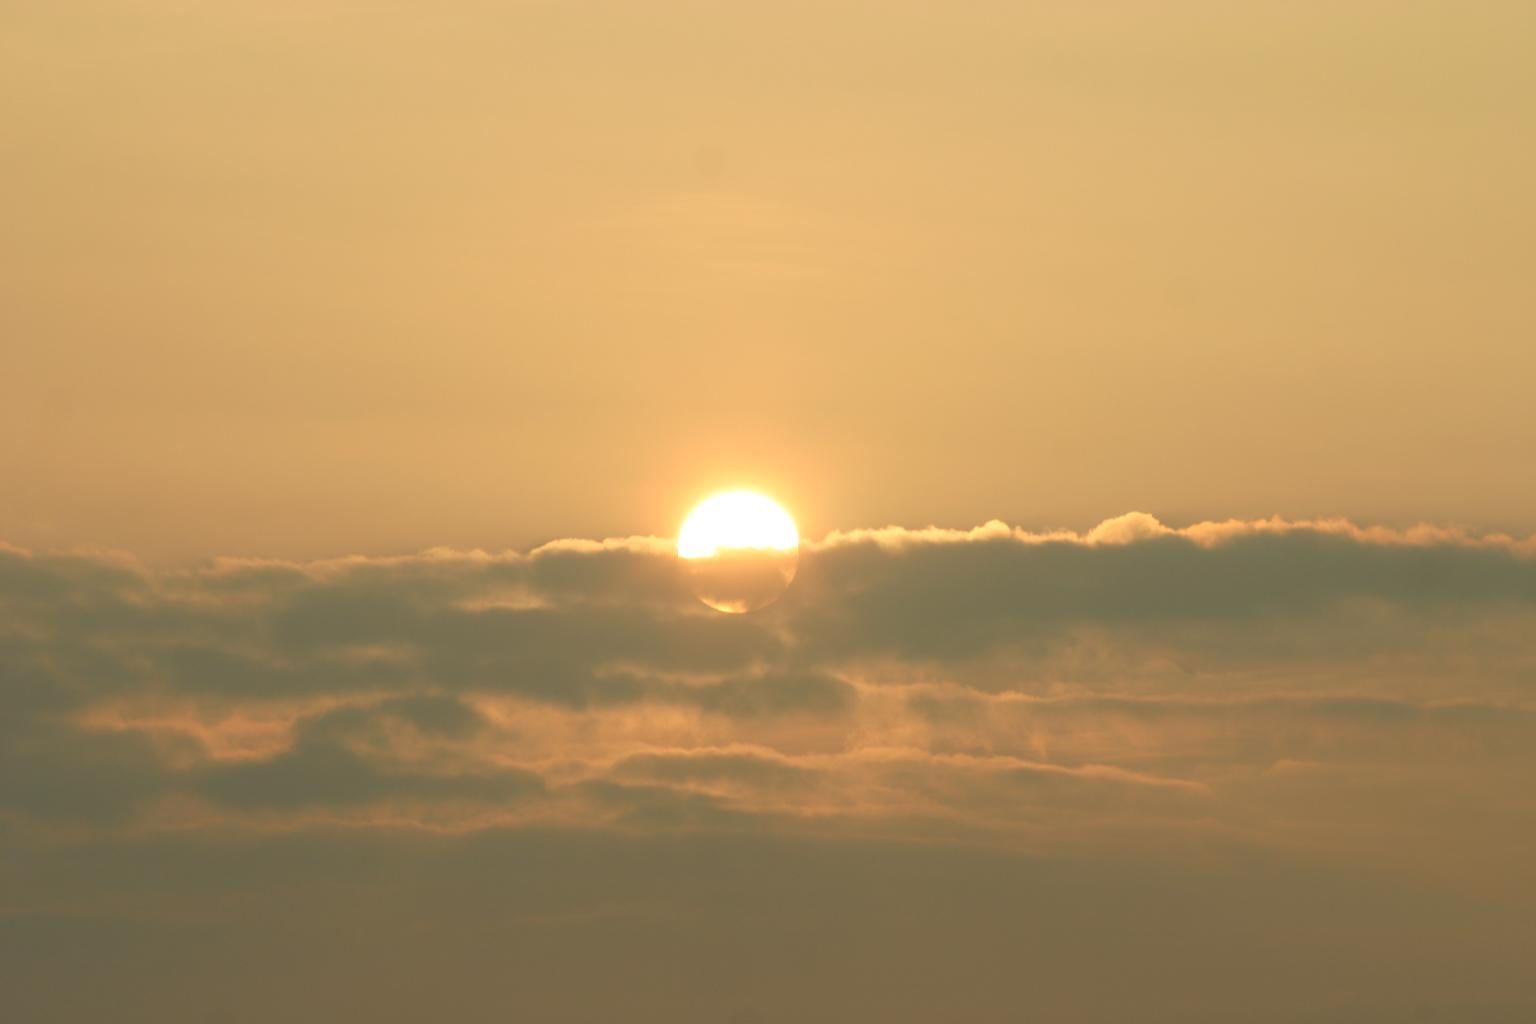 Sonnenuntergang Insel Neuwerk